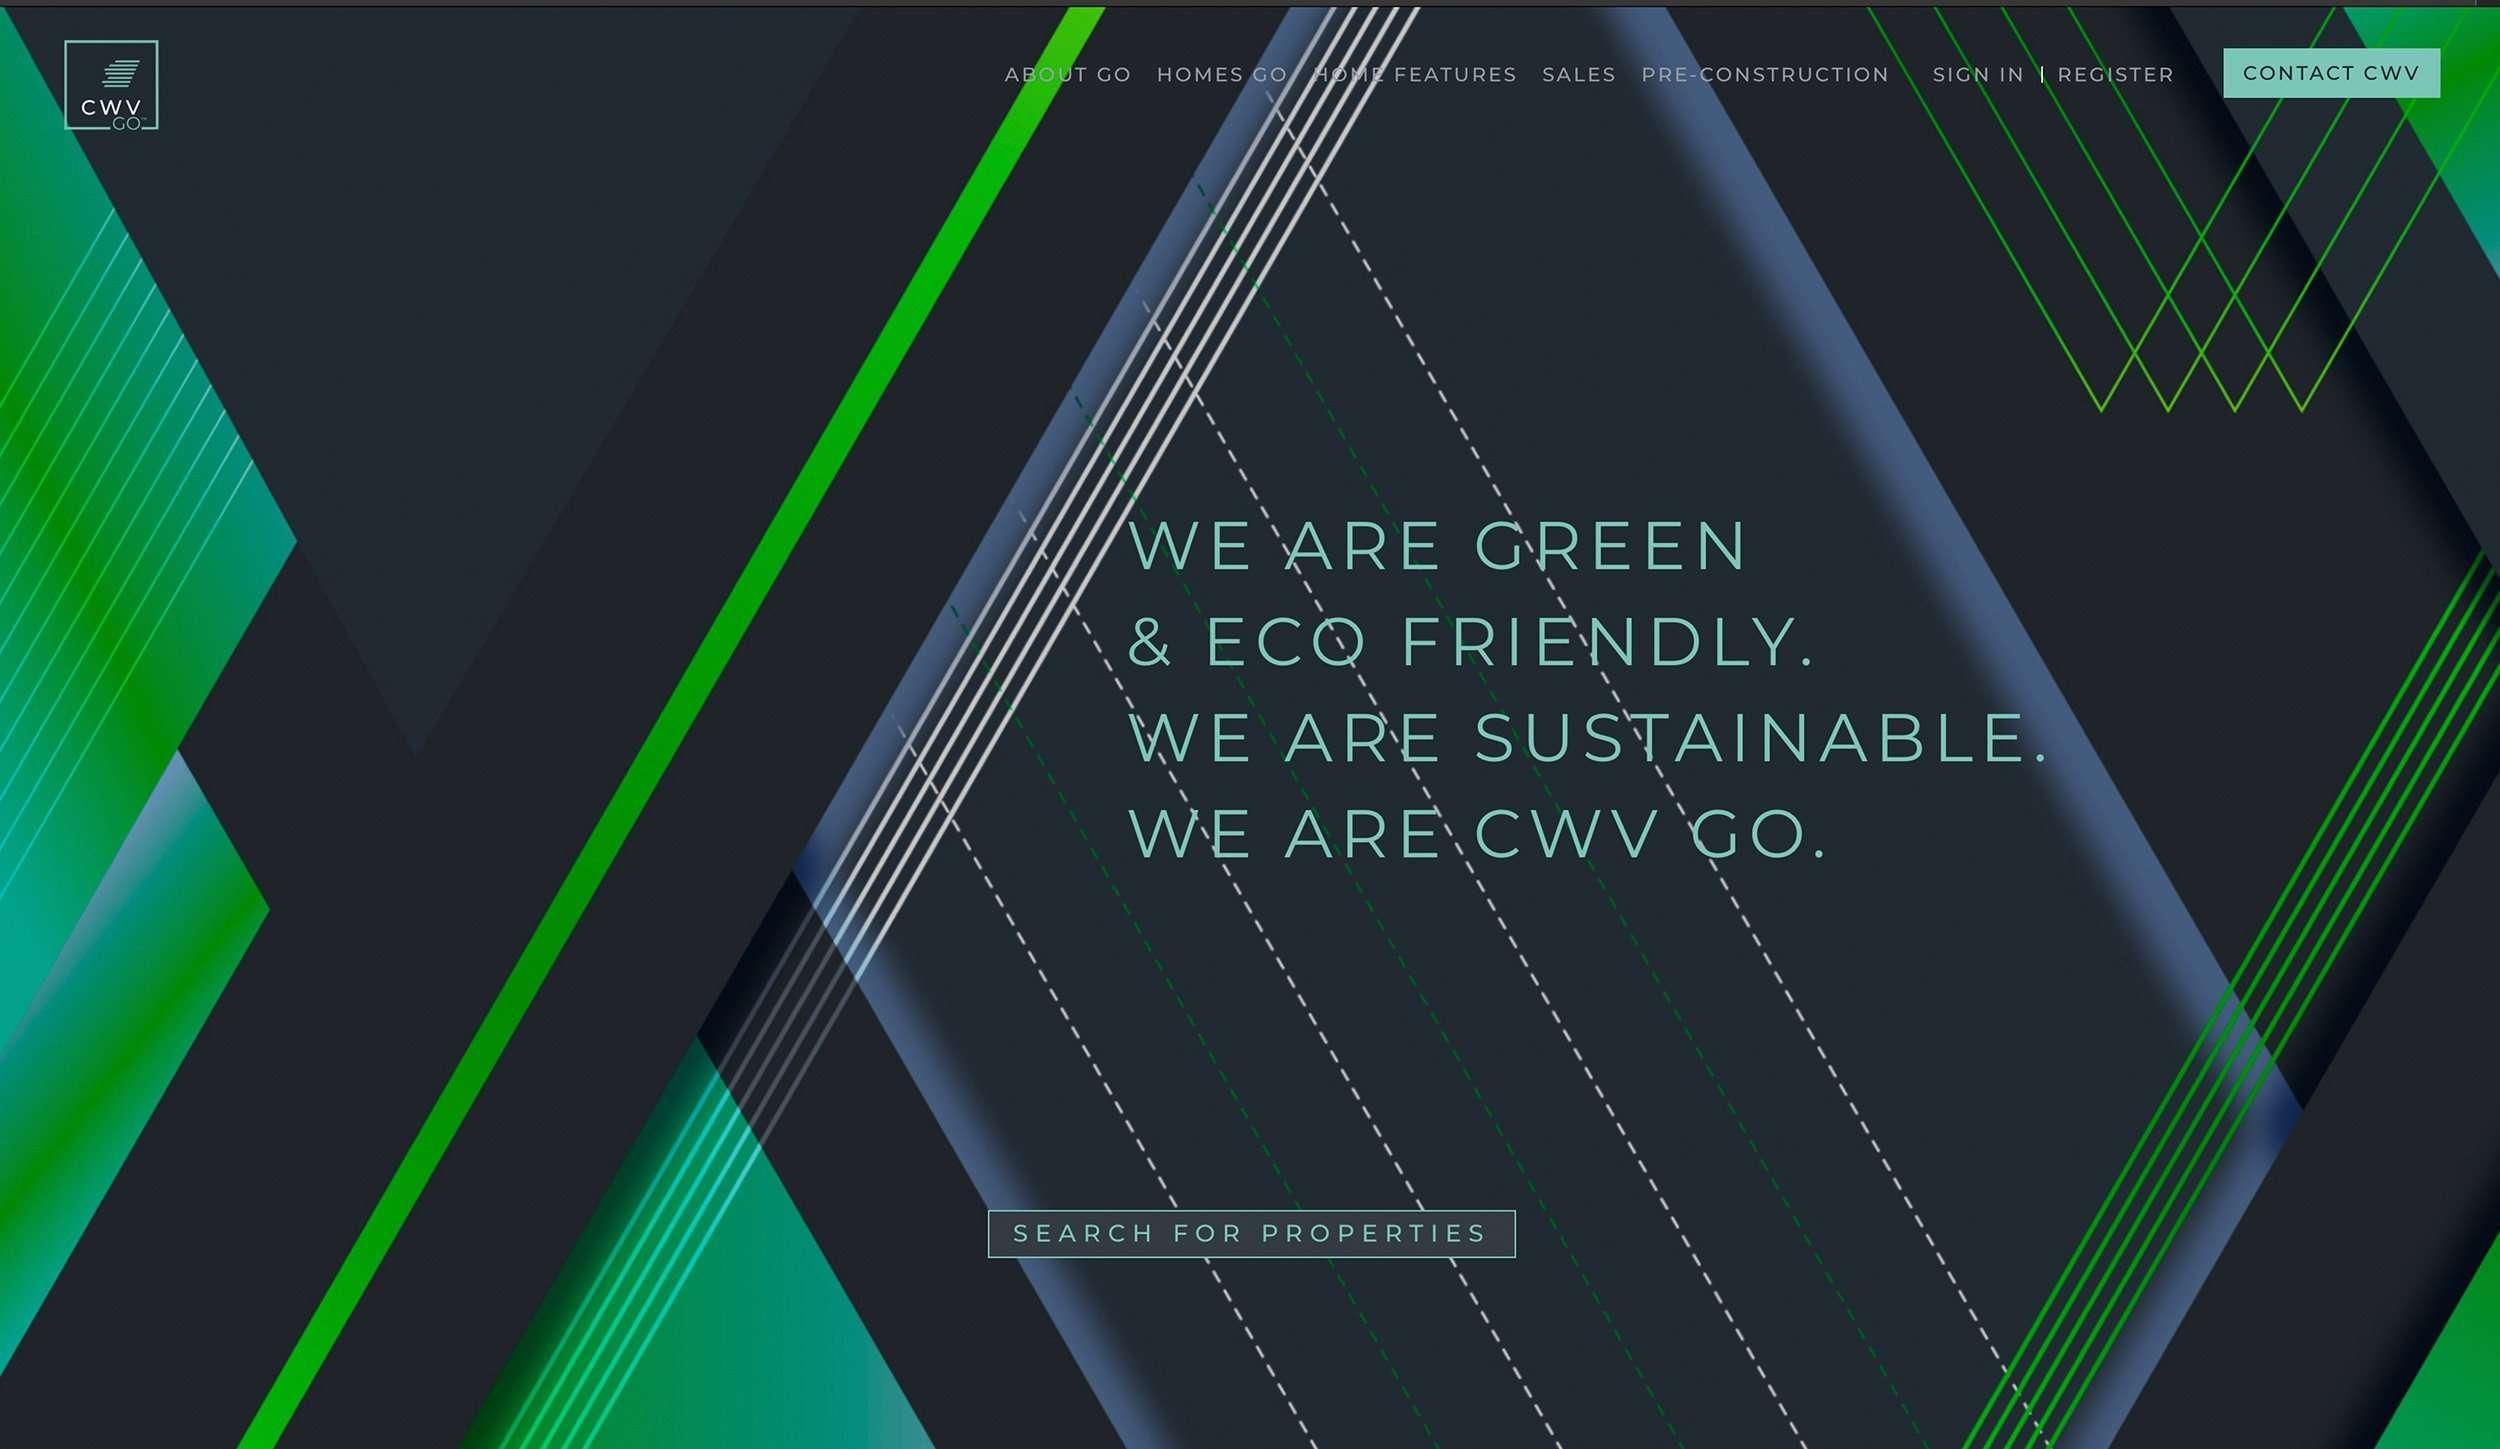 cwv-group-miami-usa-estados-unidos-real-estate-online-lab-lisbon-web-development-web-design-7